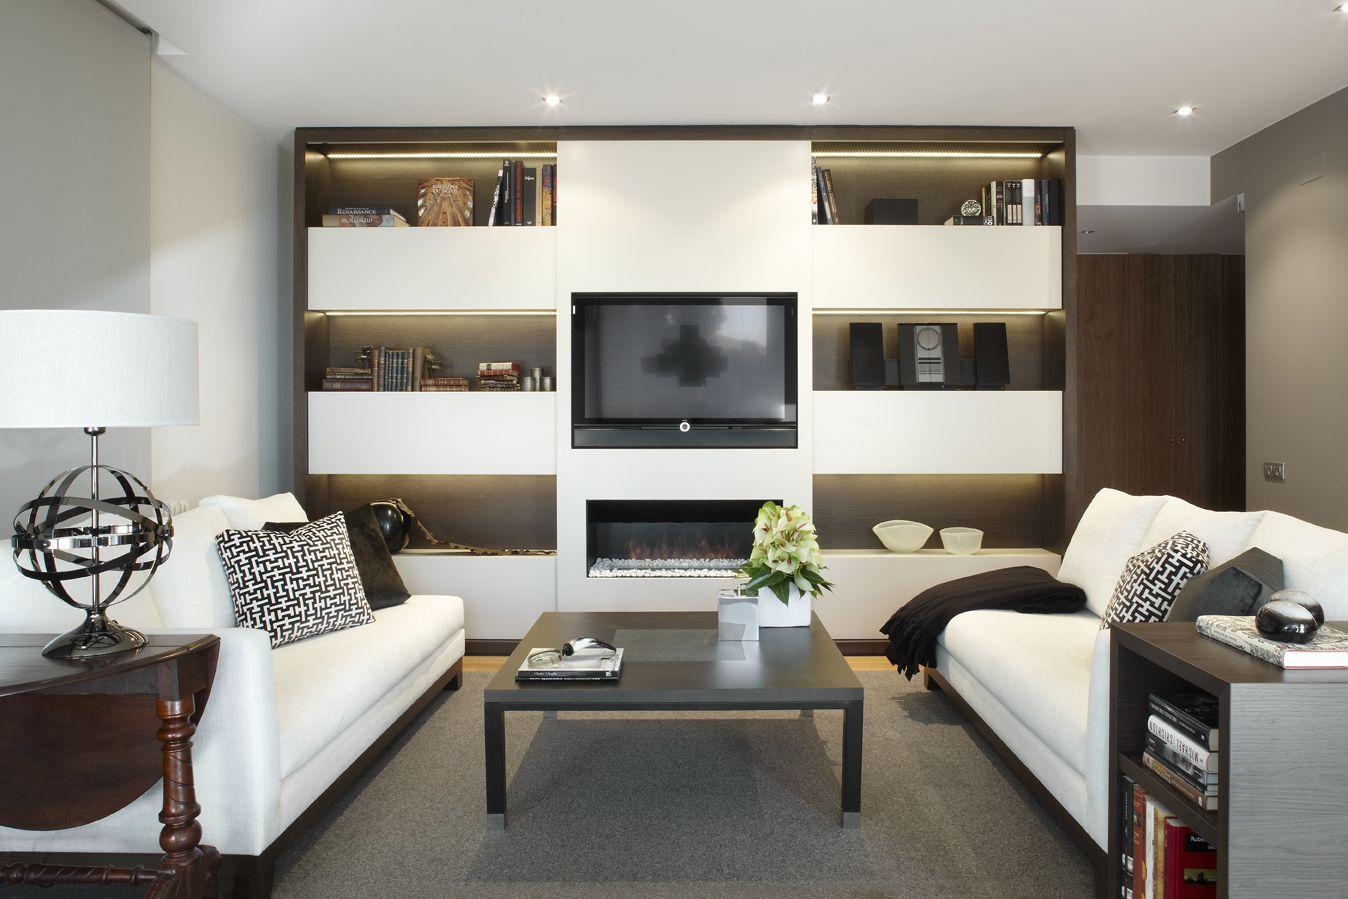 Molins interiors arquitectura interior interiorismo - Decoracion chimeneas salon ...